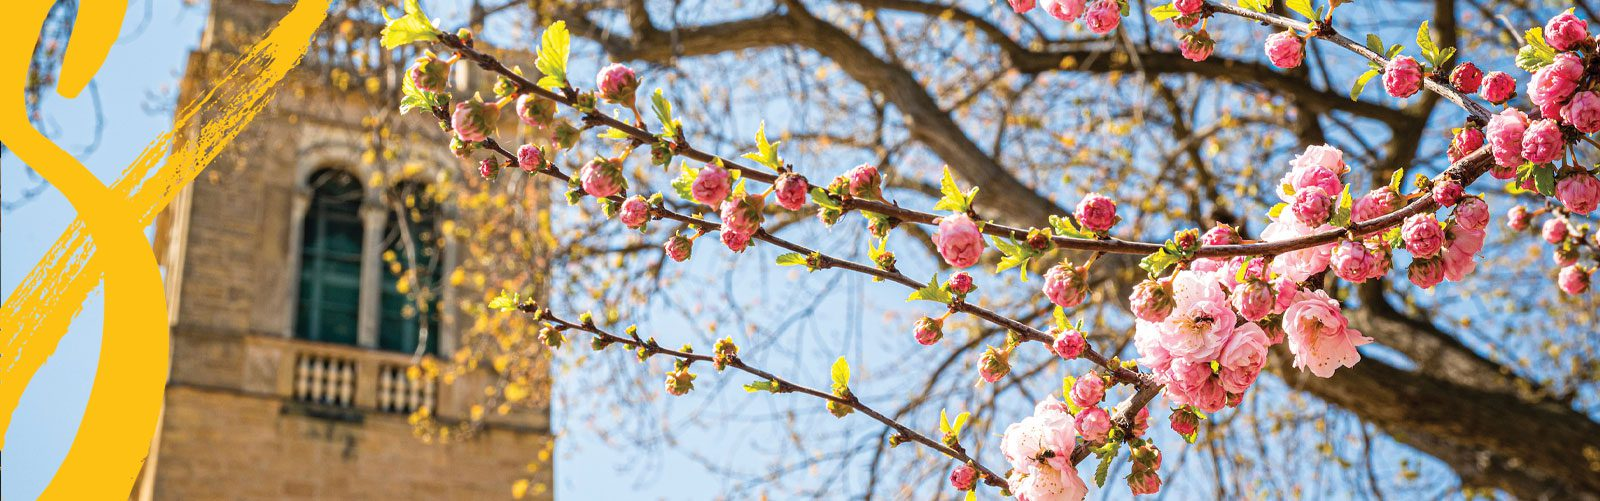 Blossoming tree near Carillon Tower